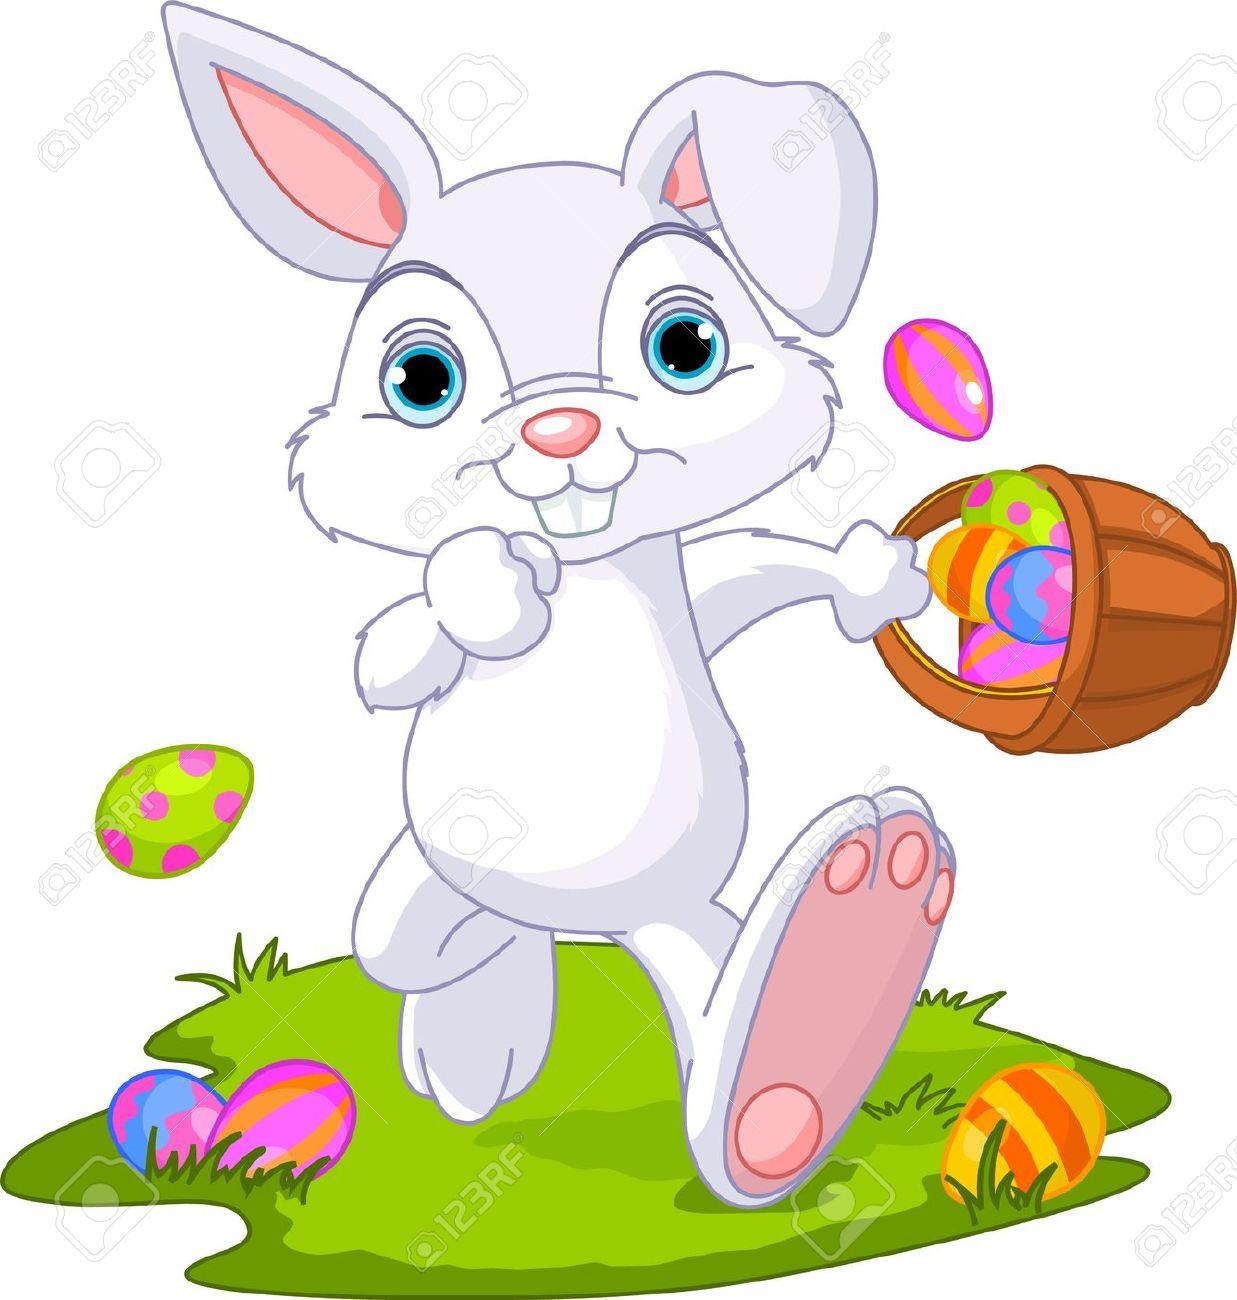 Hosue clipart easter bunny Clipart Cartoon clipart Latest collection